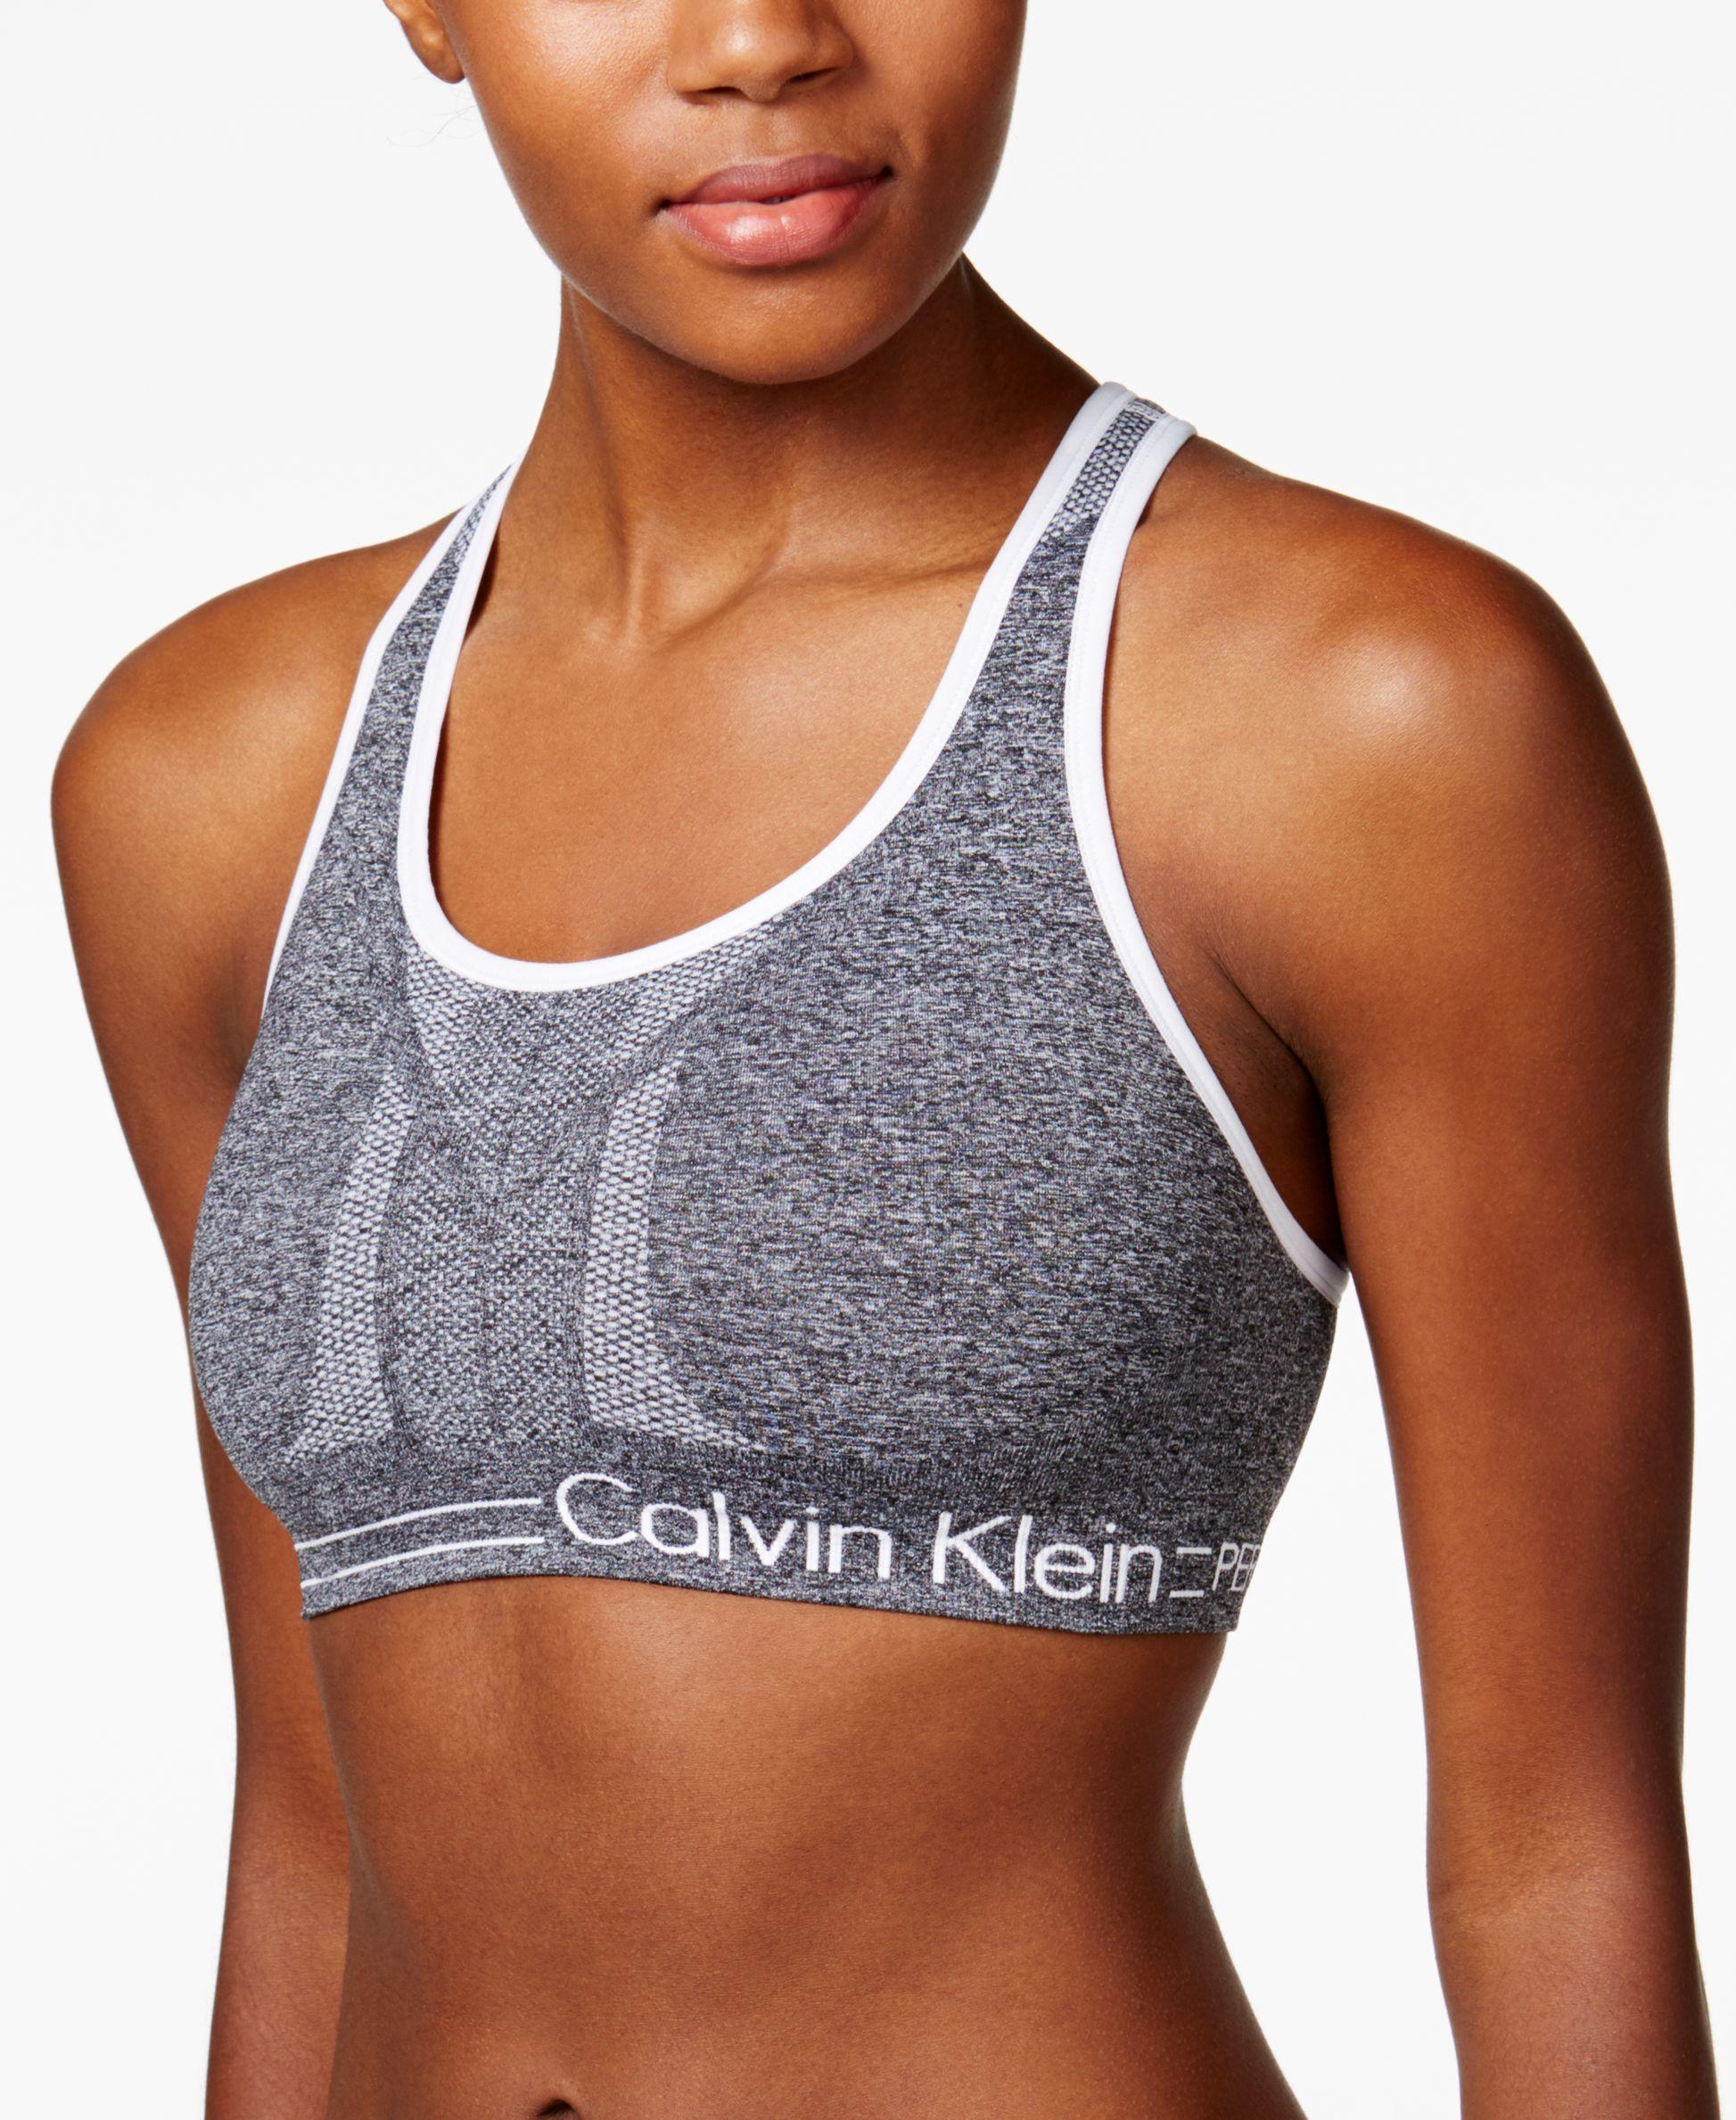 ff45b7d69a Lyst - Calvin Klein Ck Performance Reversible Crossback Mid-impact ...